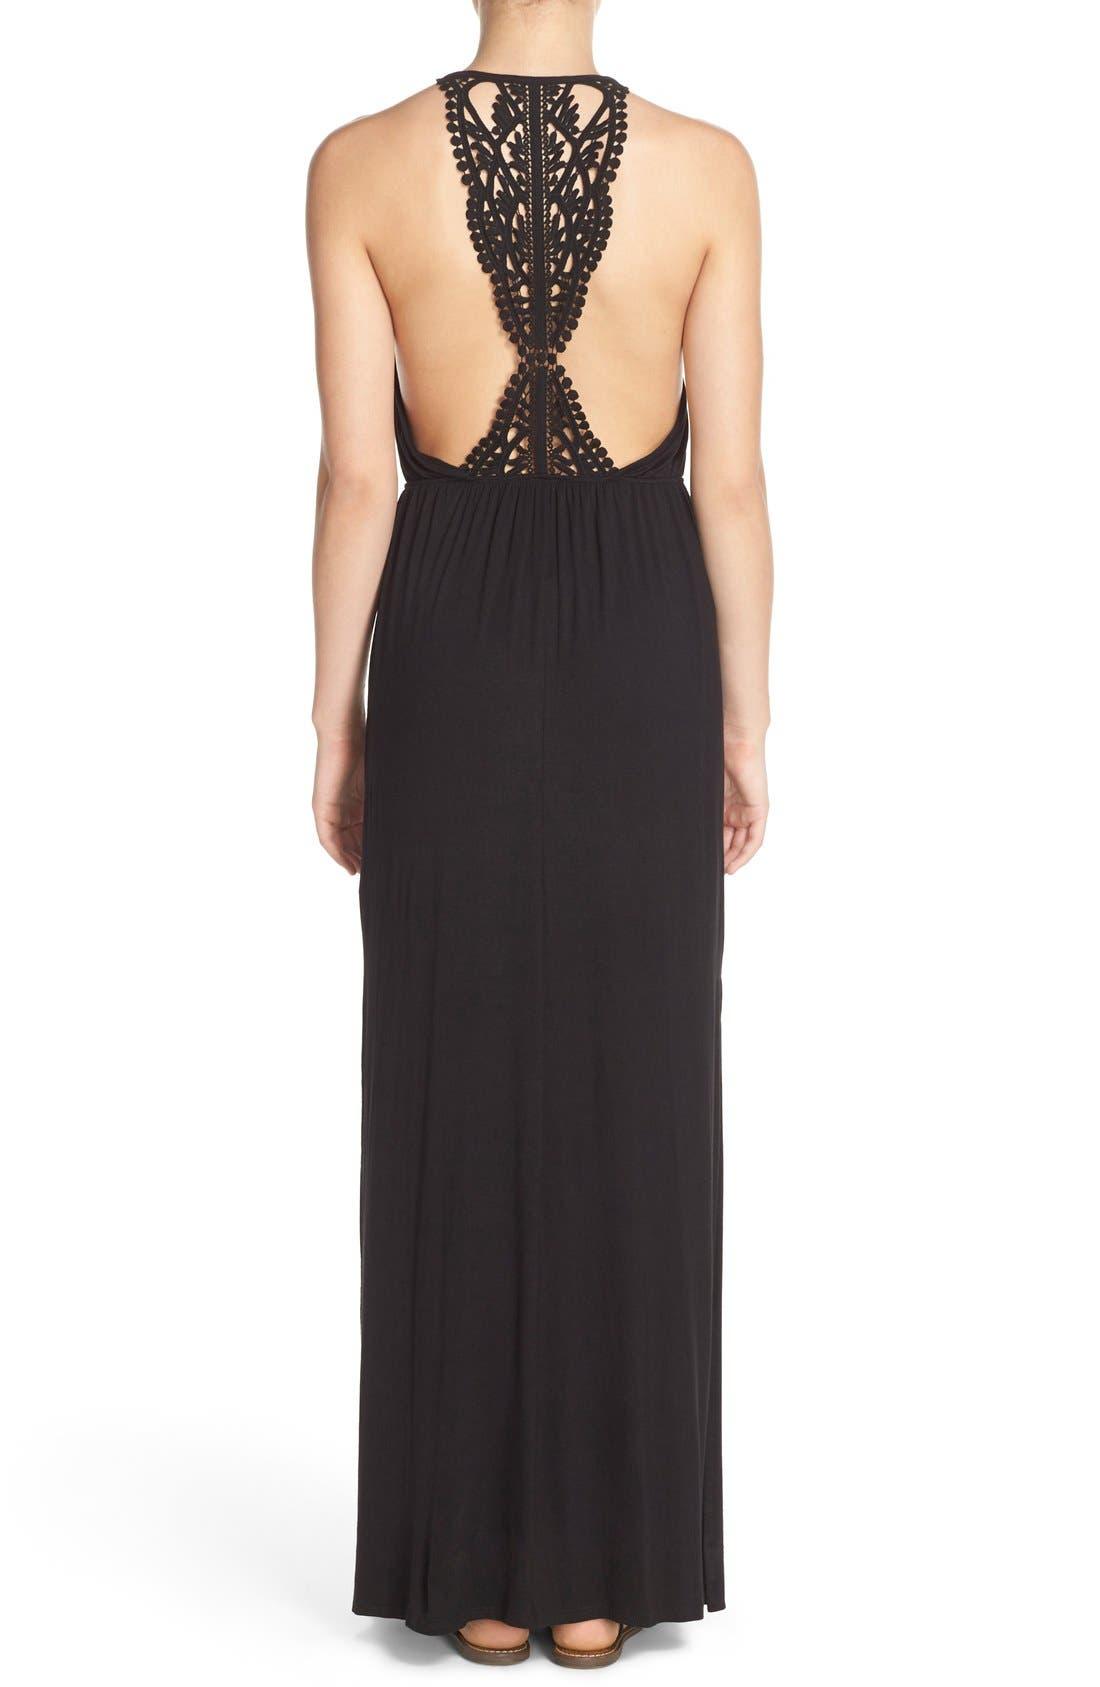 Main Image - Surf Gypsy Crochet Back Jersey Cover-Up Maxi Dress